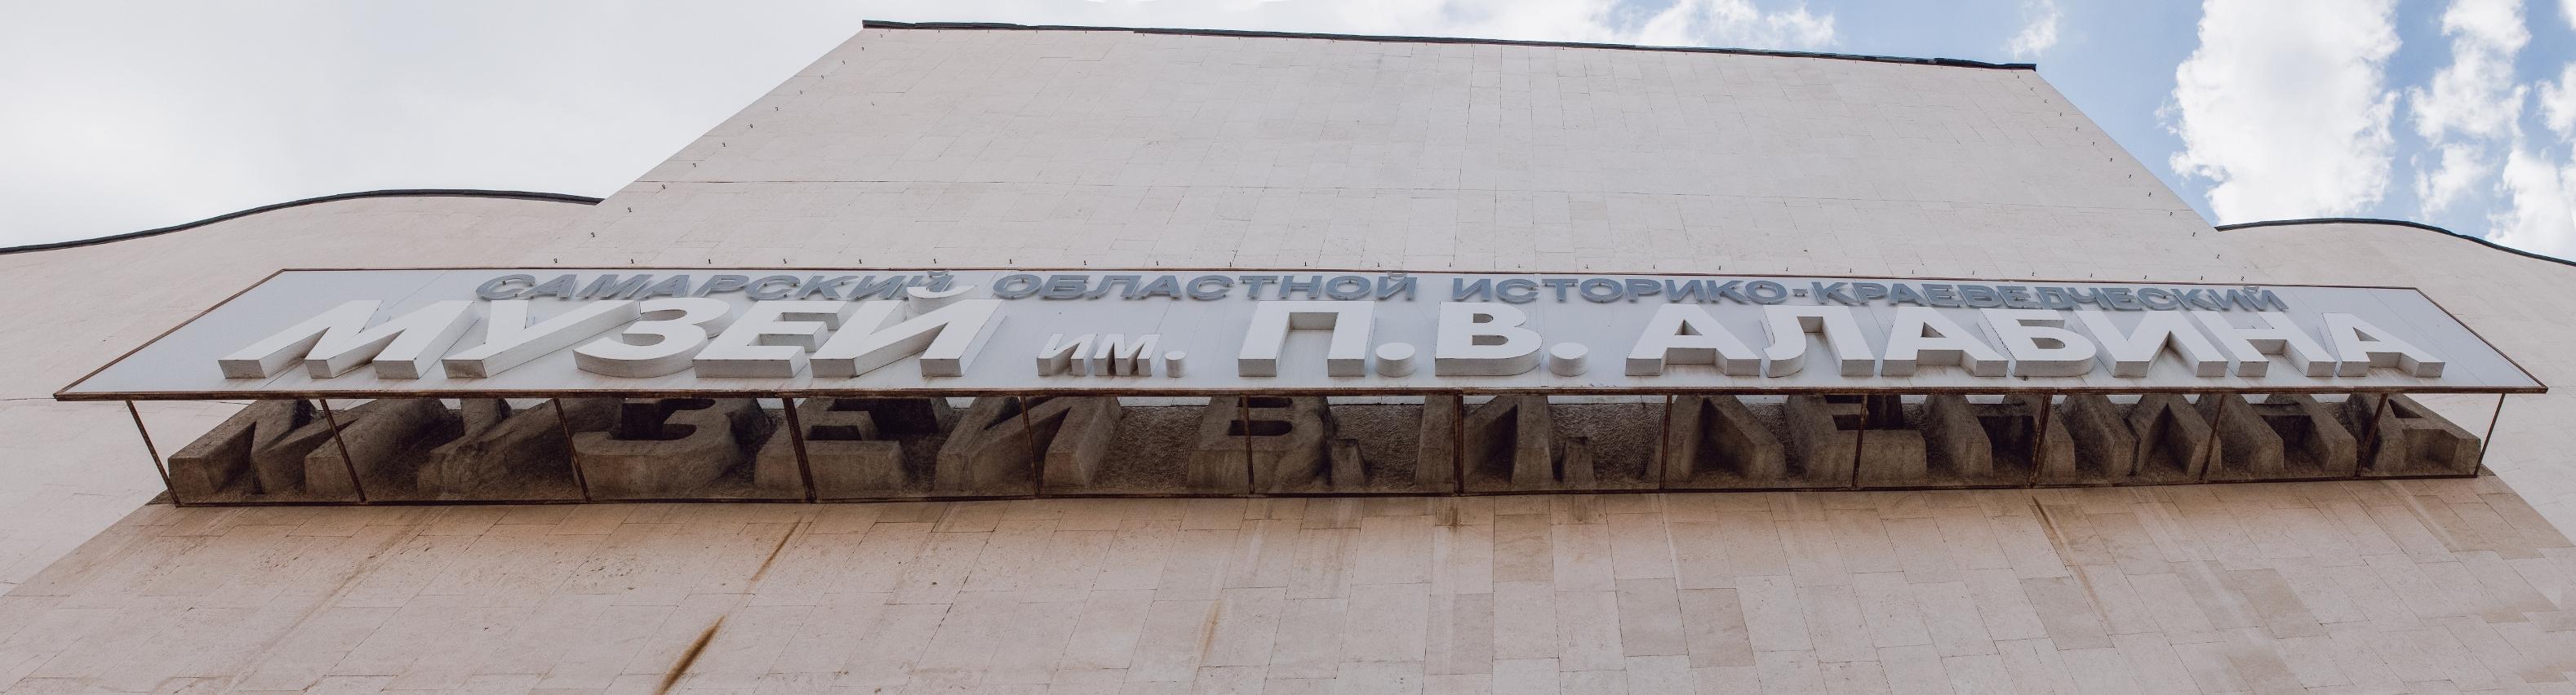 Музей имени Алабина